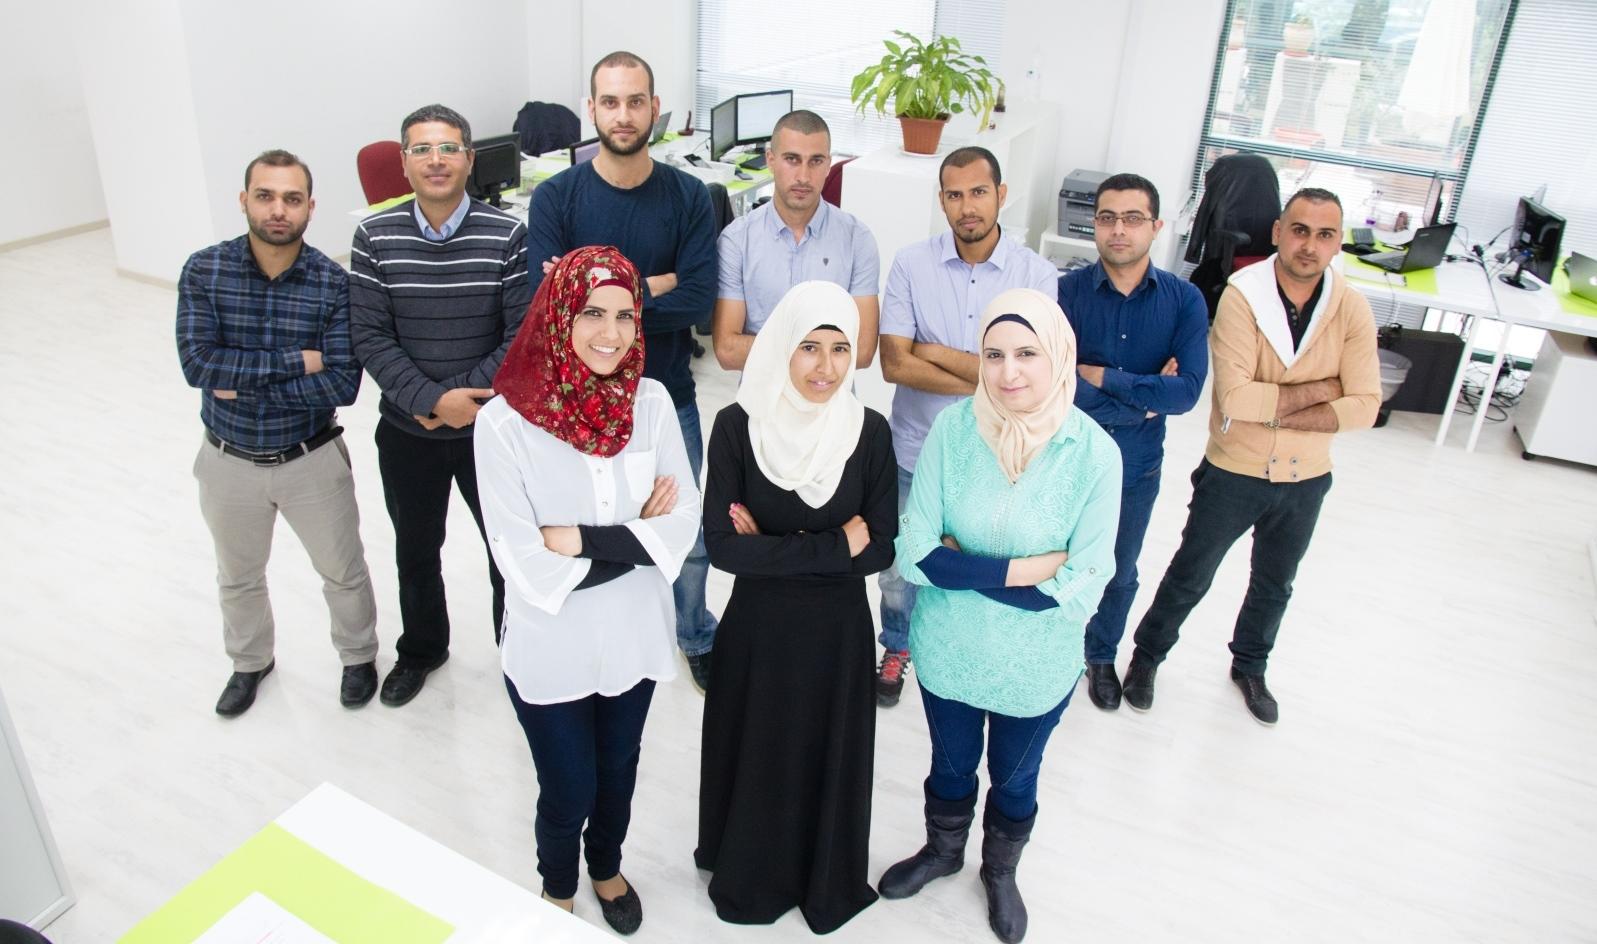 The SadelTech team. Photo by Anas Abu-Daabis